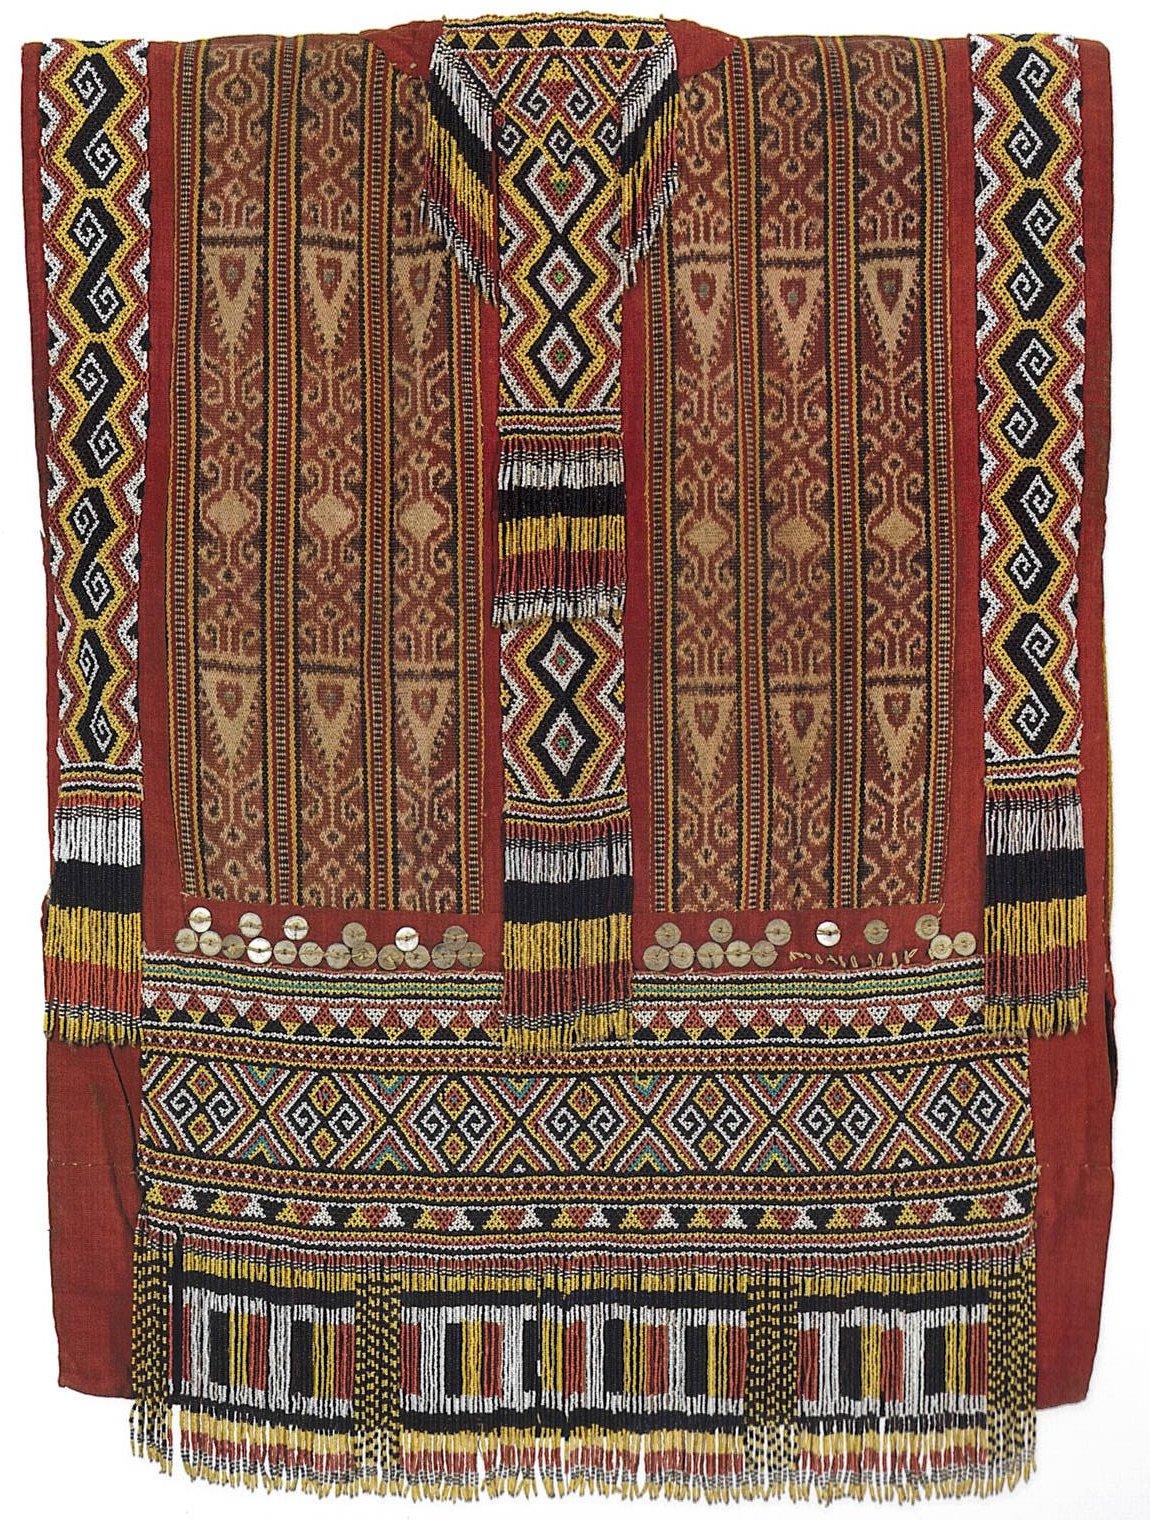 Iban Tribal Ikat Shirt |  Wikimedia Commons